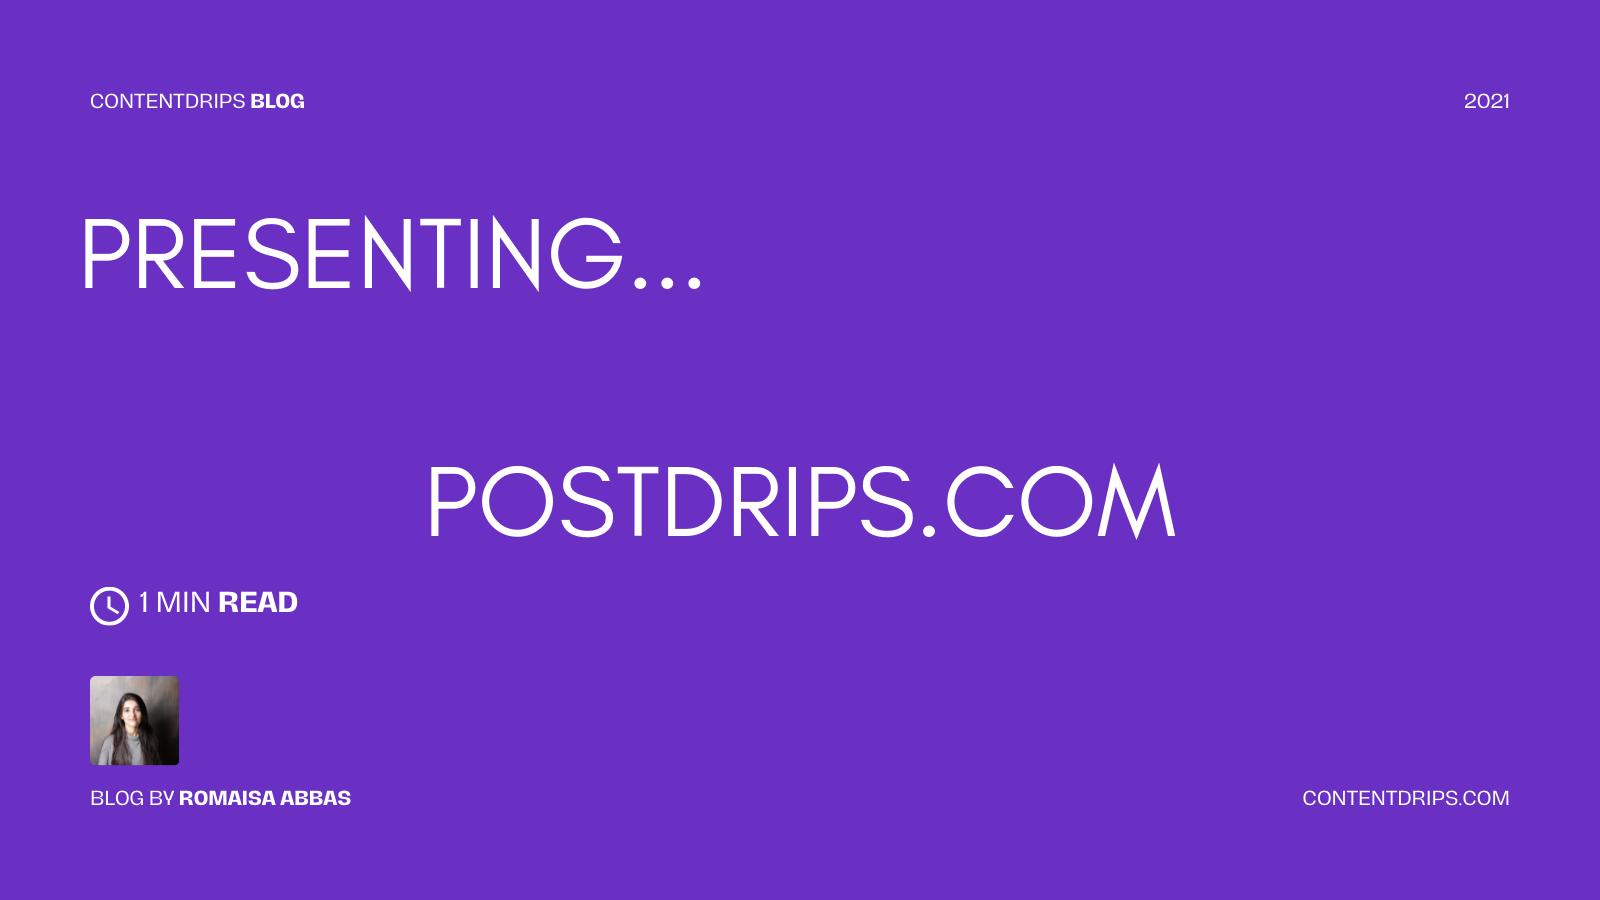 Presenting PostDrips